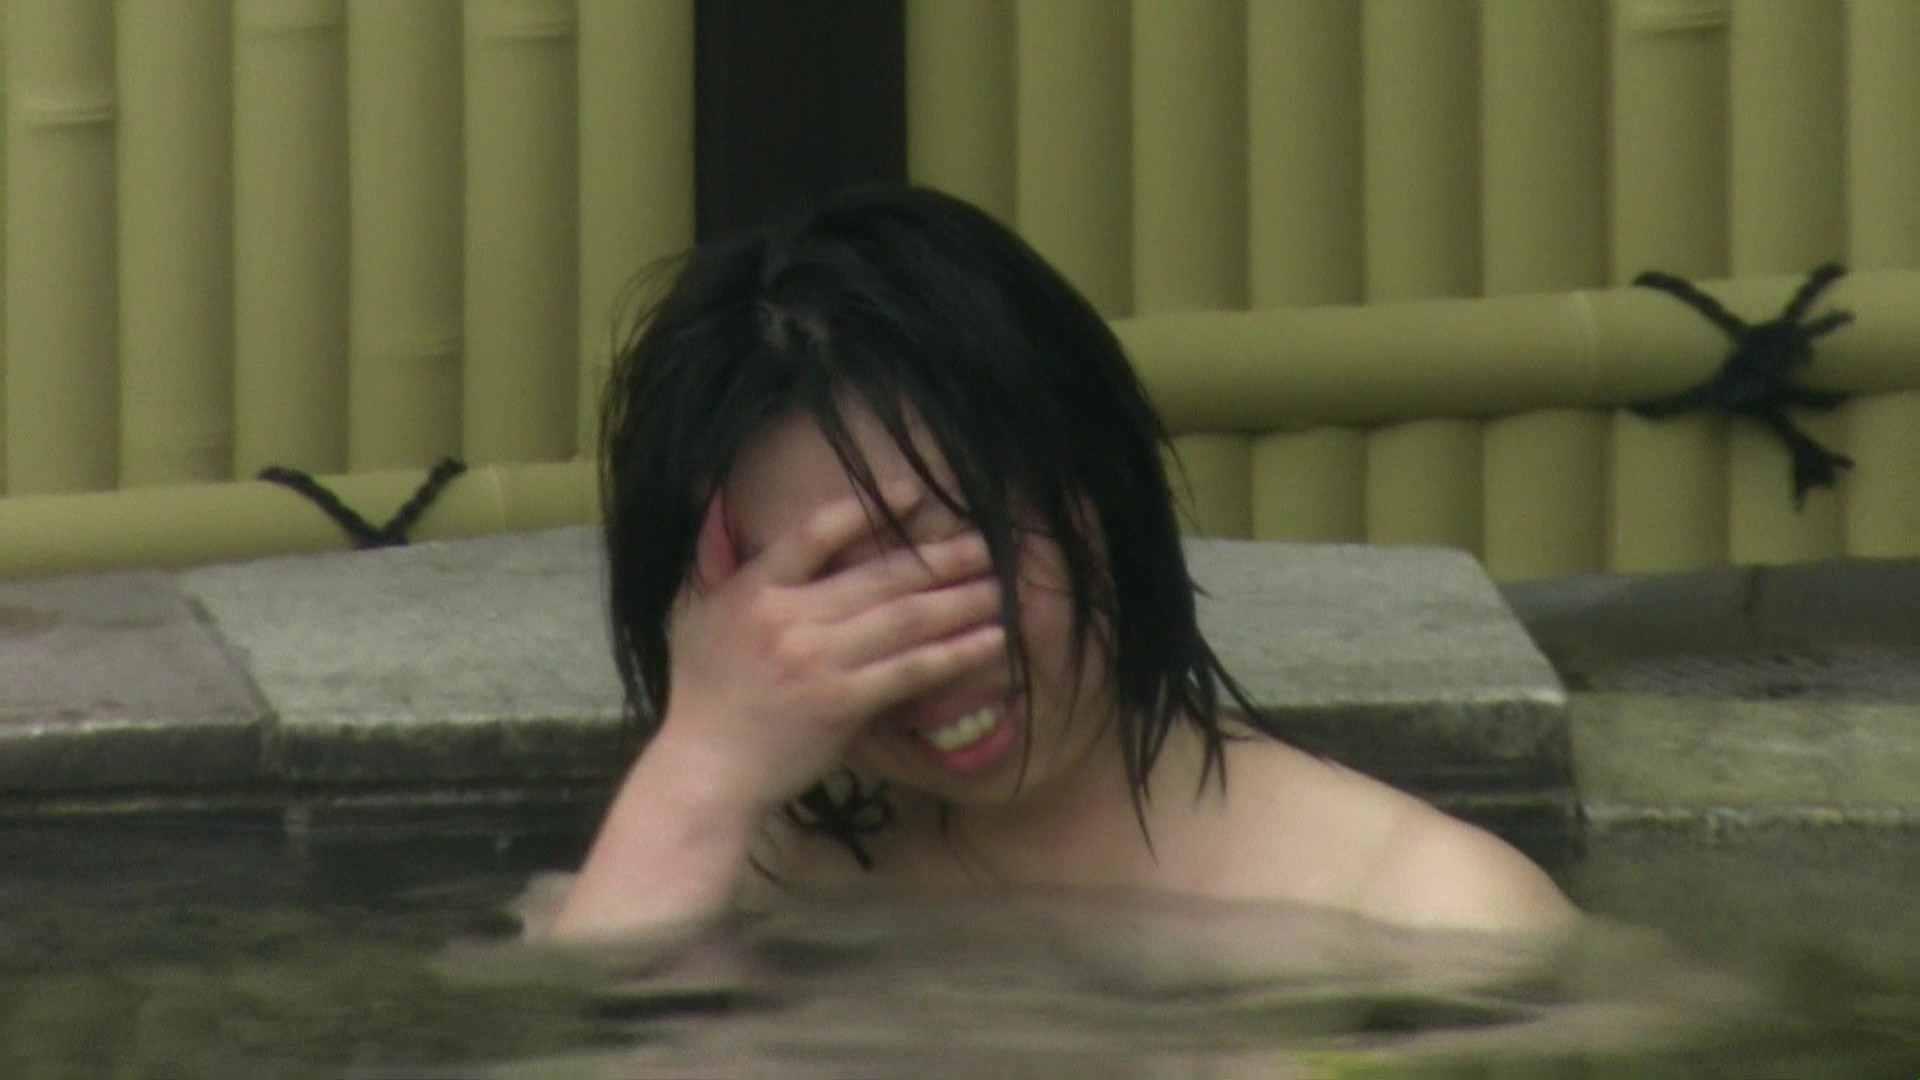 Aquaな露天風呂Vol.07 盗撮シリーズ   露天風呂編  94PIX 1